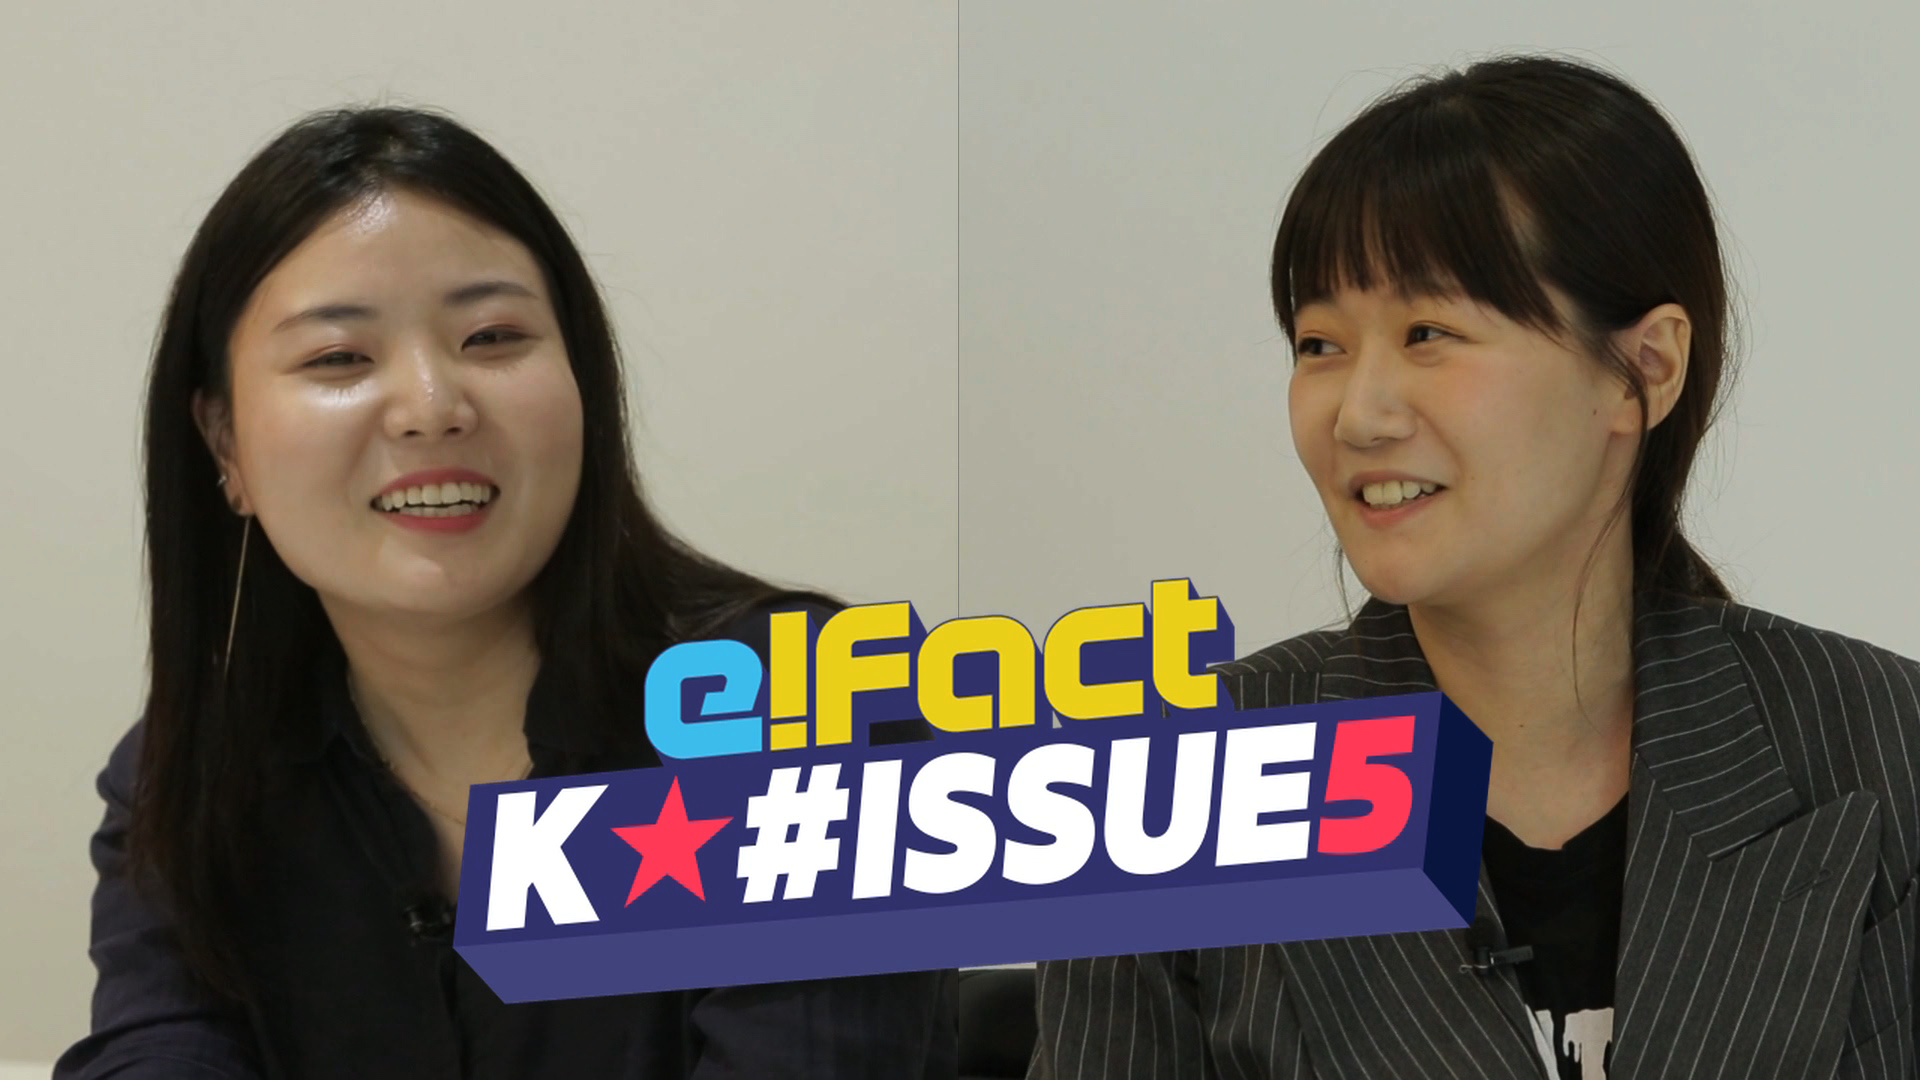 [e!Fact_K★#ISSUE5] 수지 이동욱 결별 비하인드부터 김현중 복귀작 논란까지 한번에 정리!